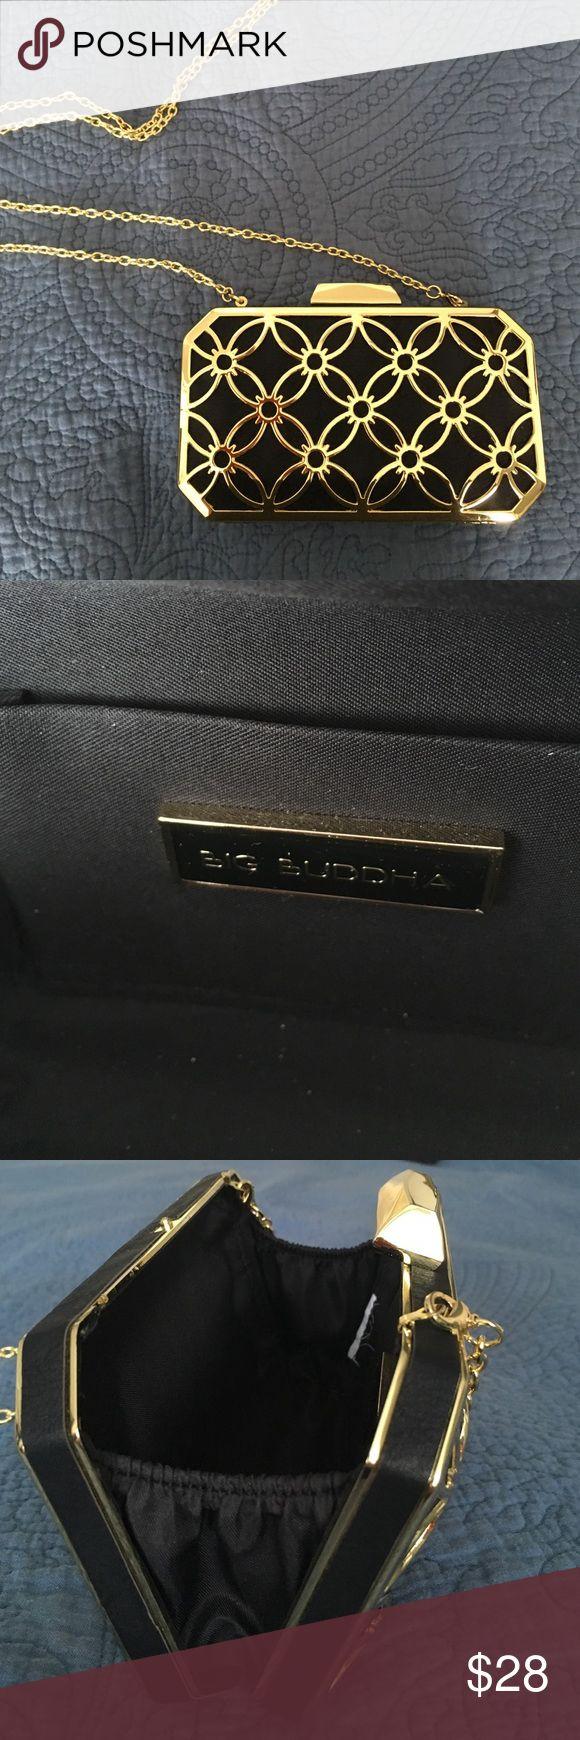 Chain and clutch evening bag gold Evening bag Big Buda Big Buddha Bags Clutches & Wristlets